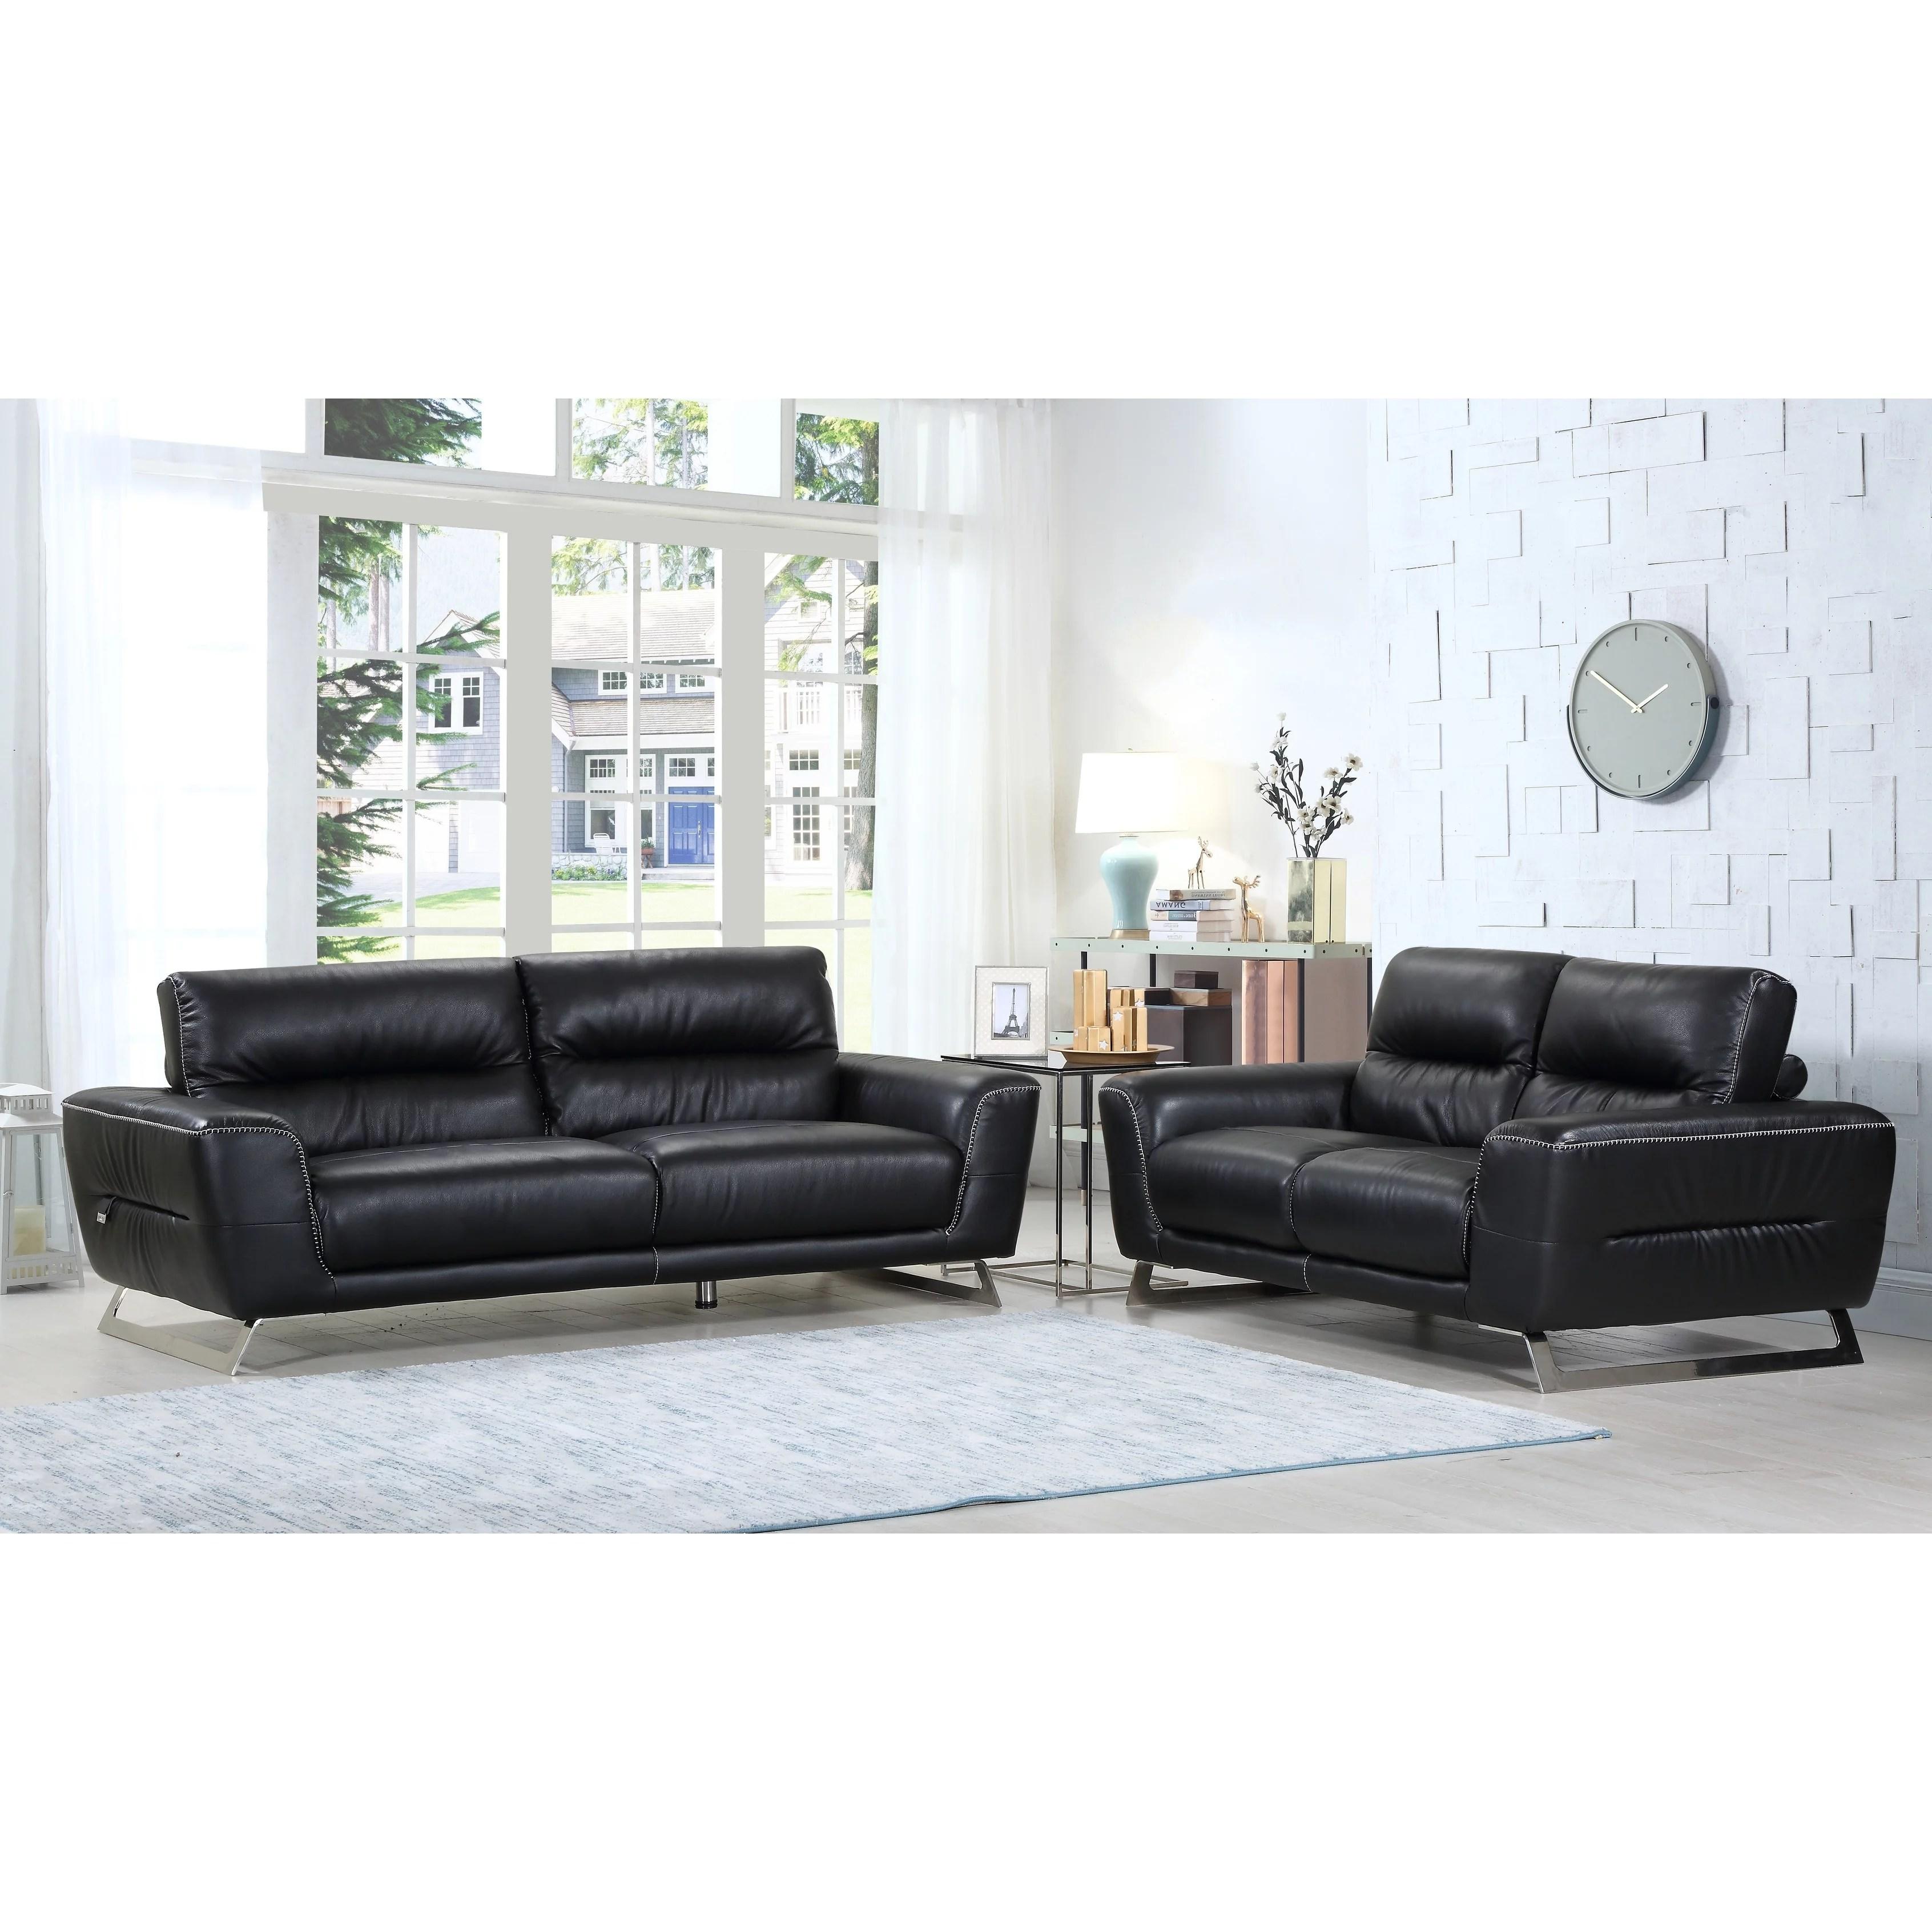 living room furniture leather and upholstery ergonomic divanitalia torino luxury italian upholstered 2 piece sofa set walmart com